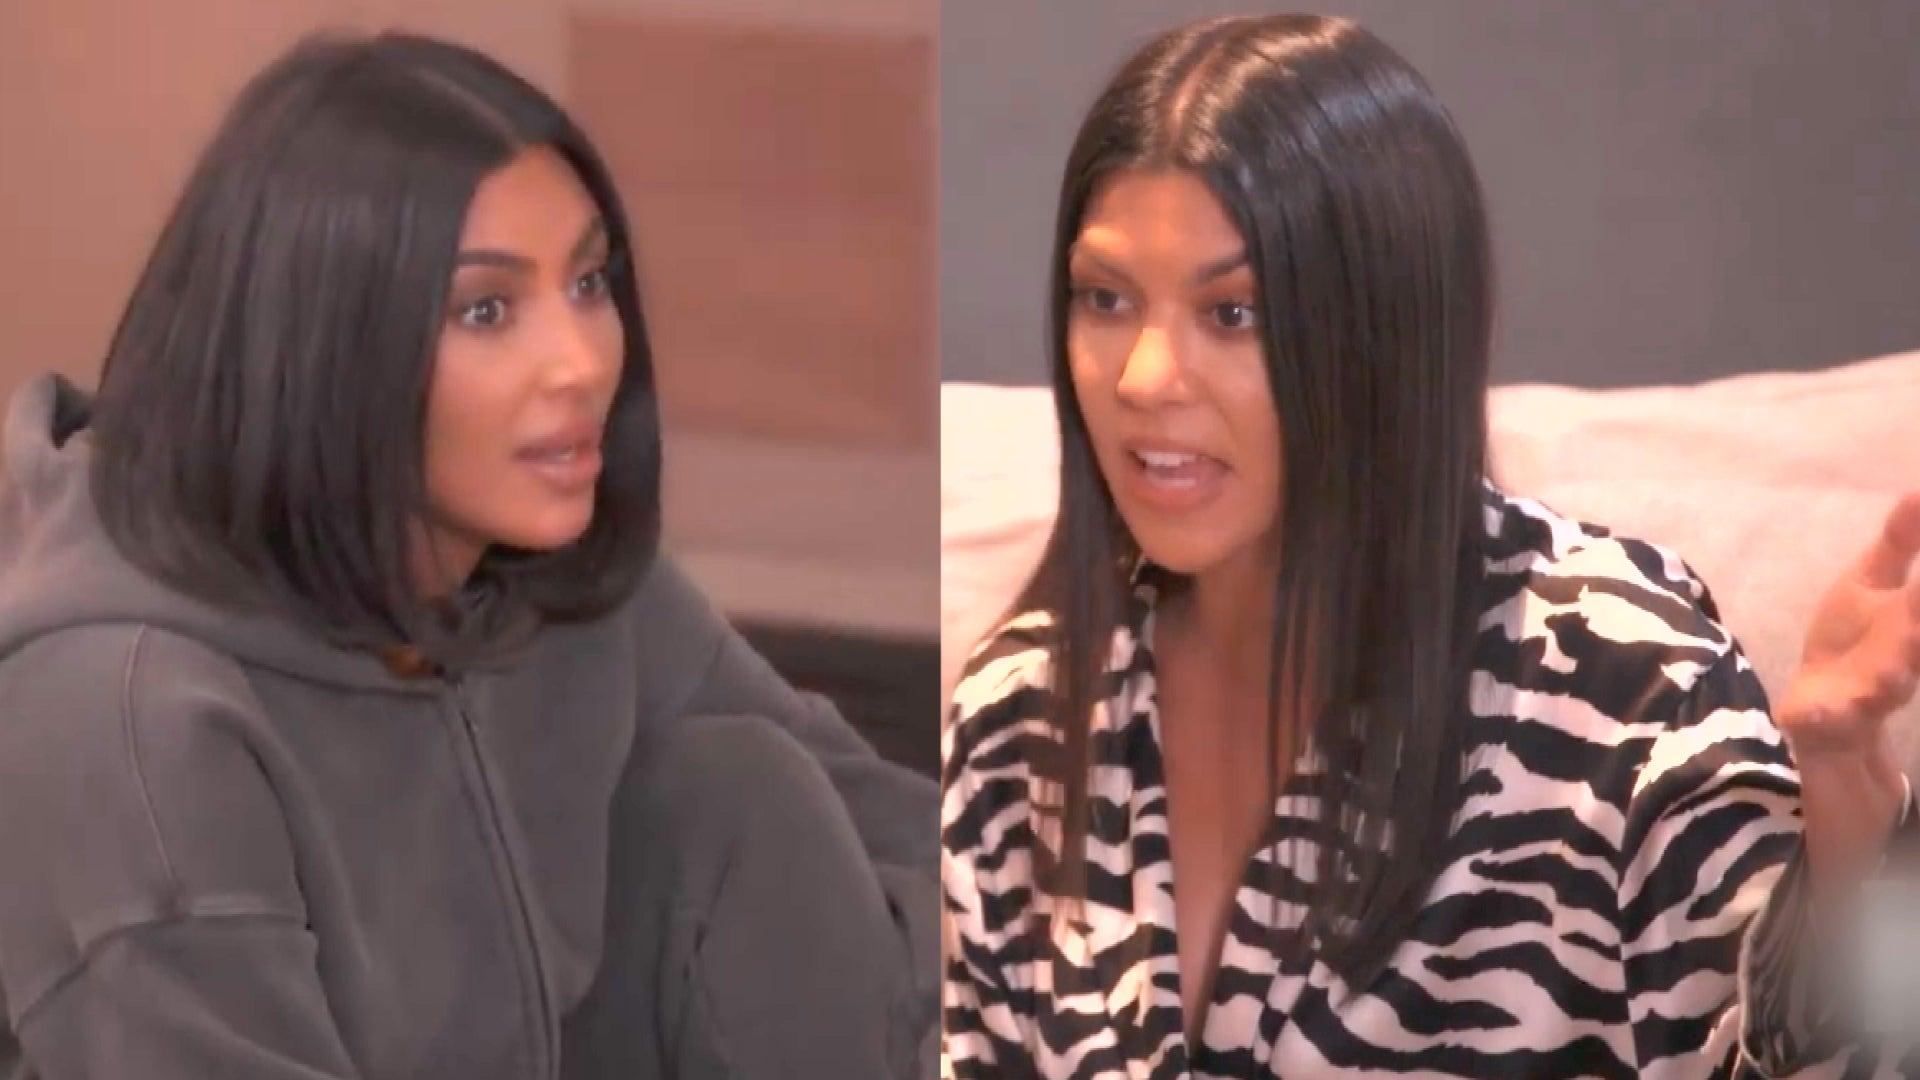 Kim & Kourtney Kardashian Get in a Massive Argument Over Daughters North & Penelope's Birthday Bash